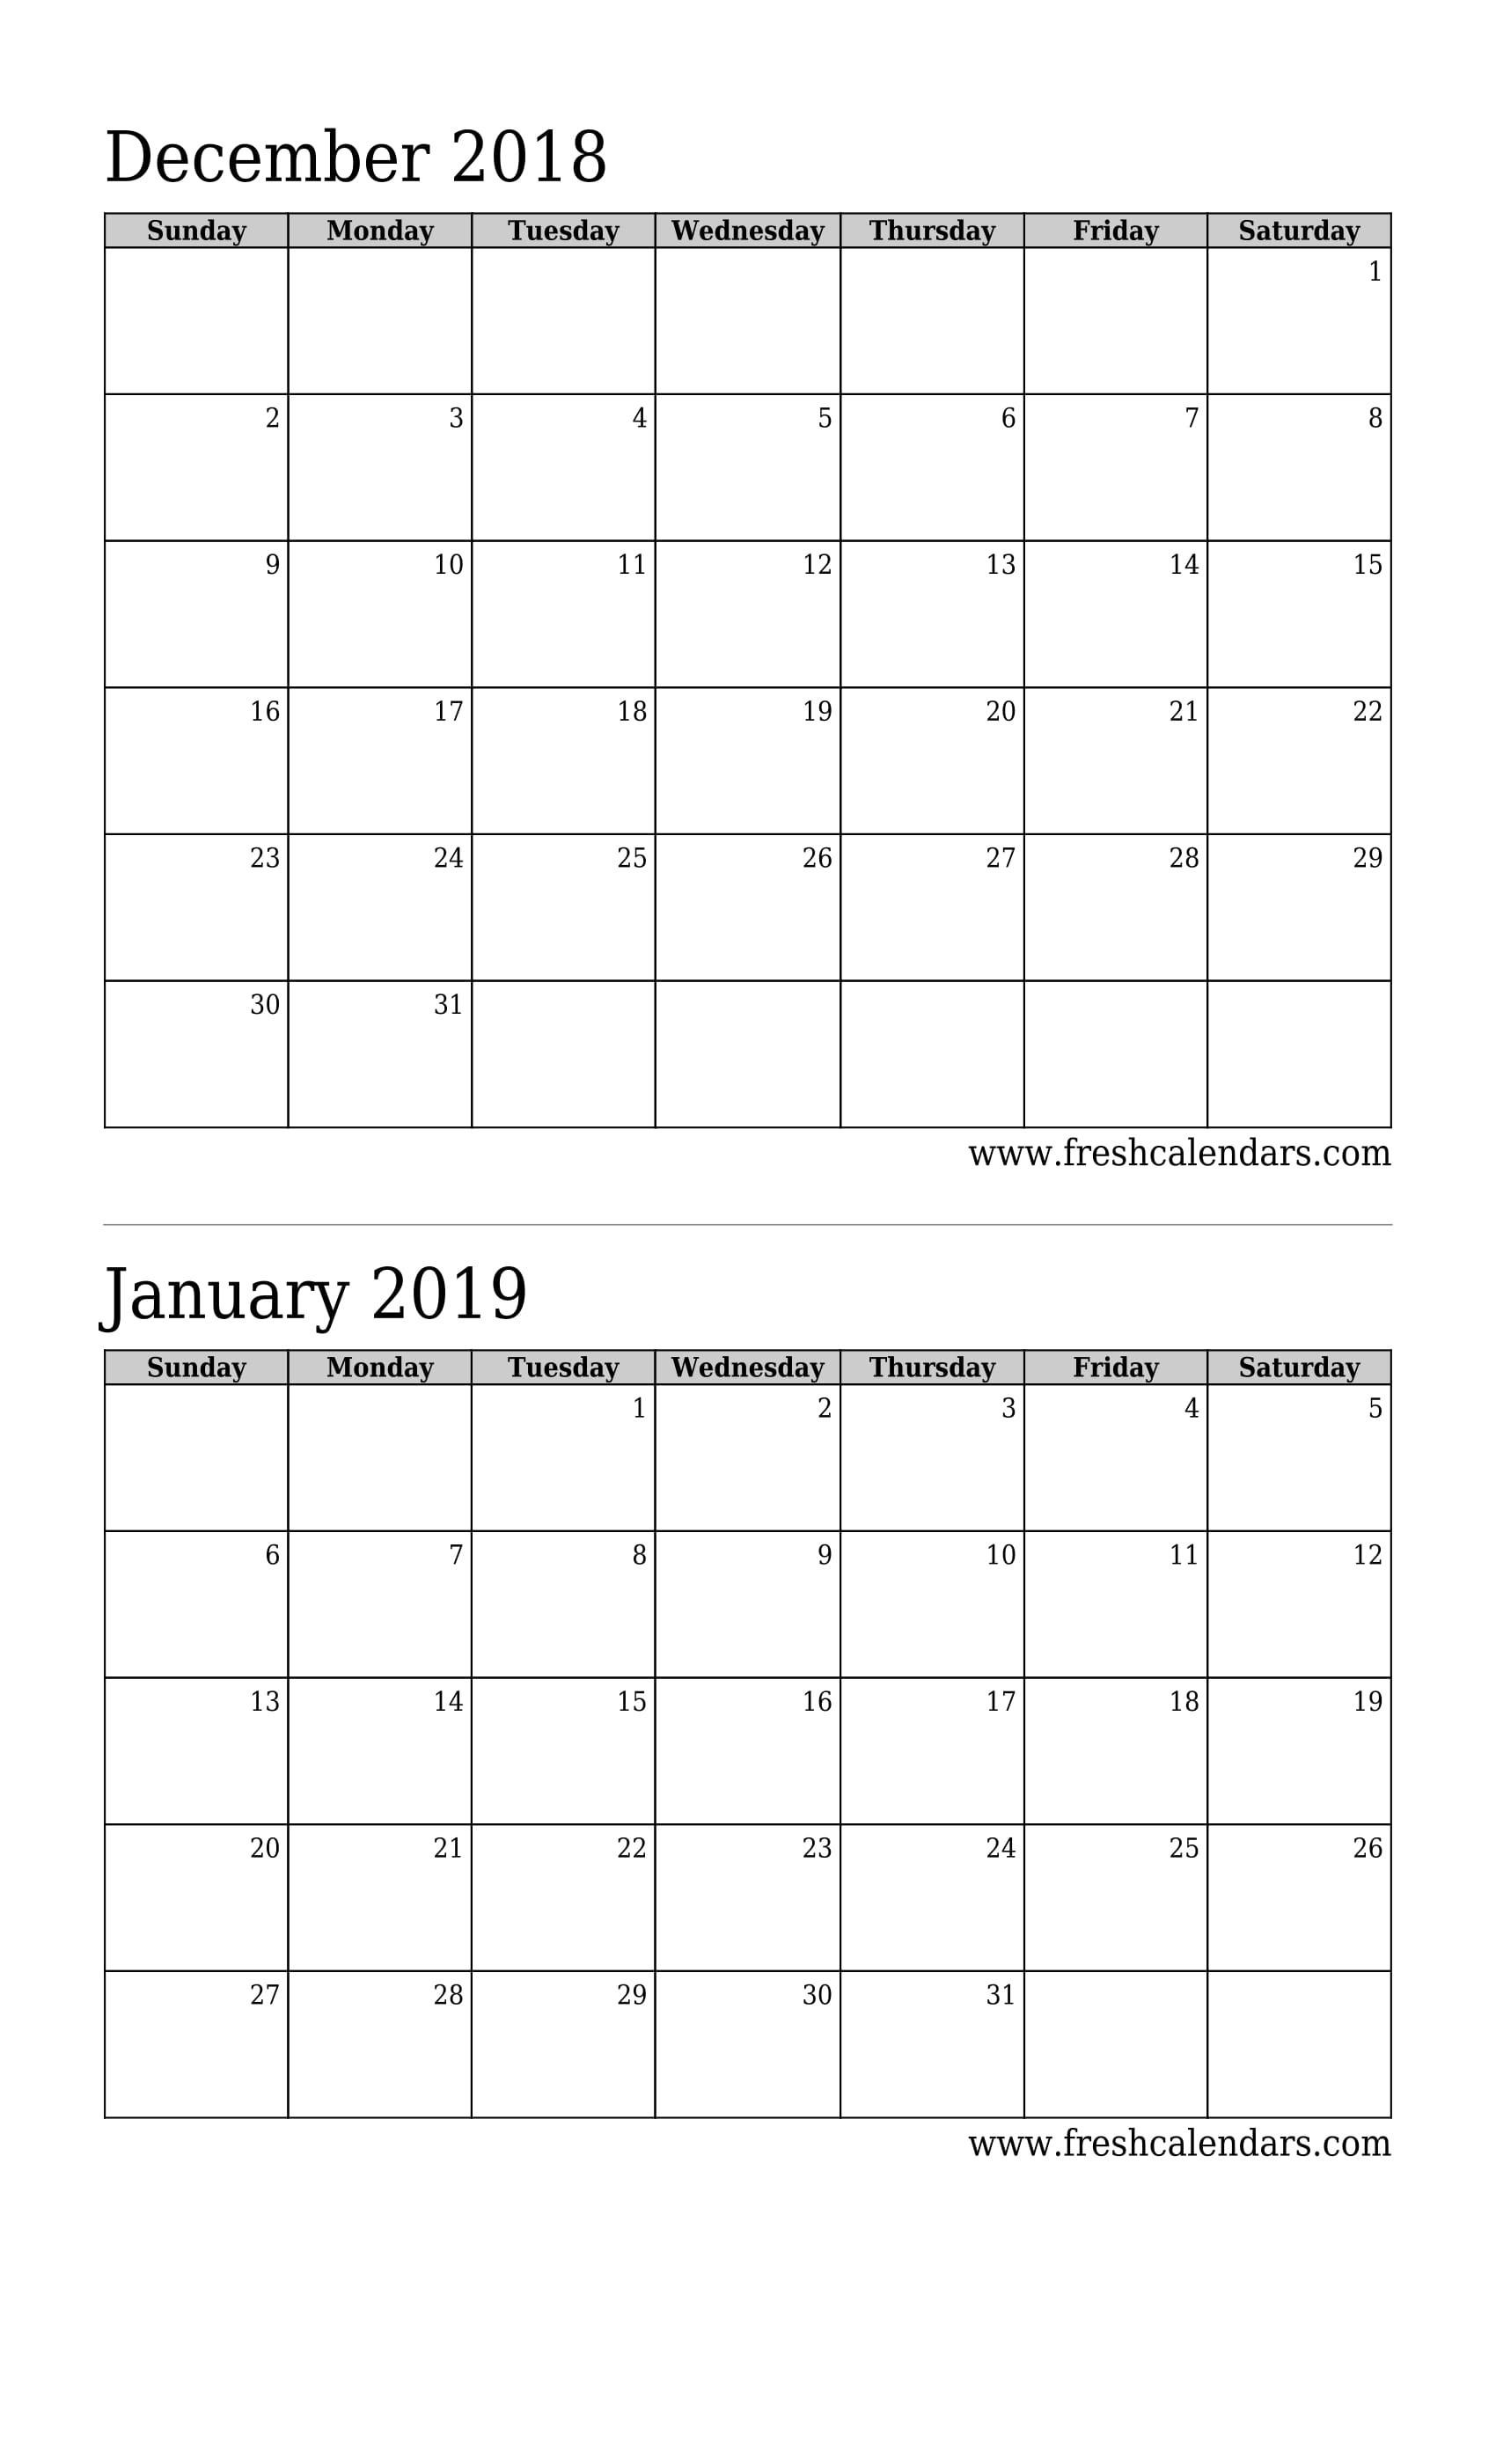 December 2018 Calendar Printable - Fresh Calendars Free Printable Calendar Double Month